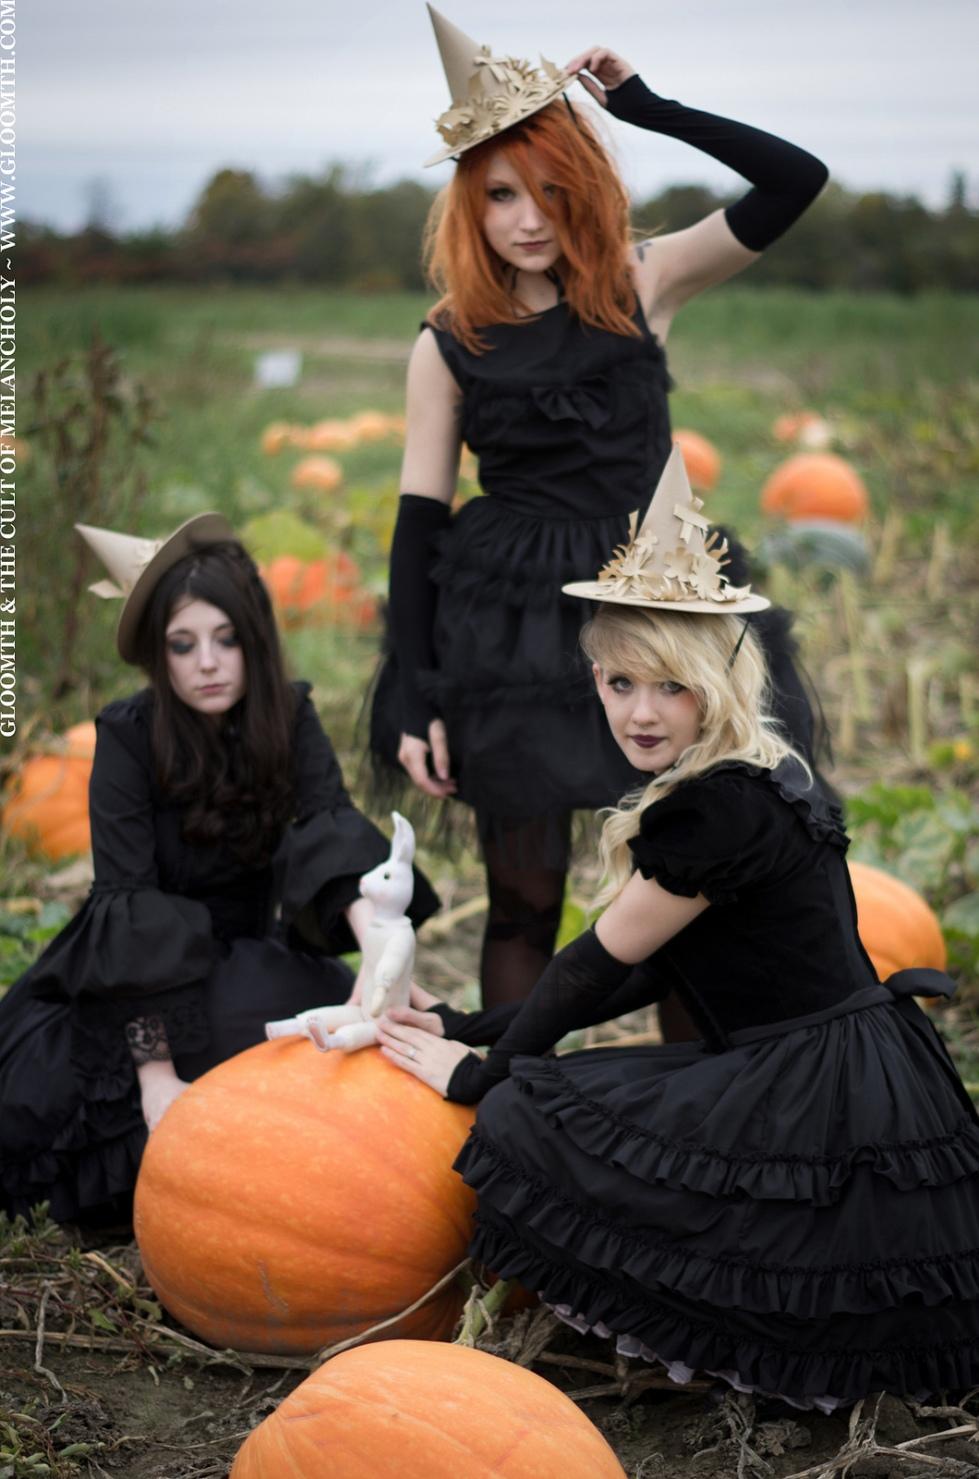 gothic girls witch in pumpkin patch